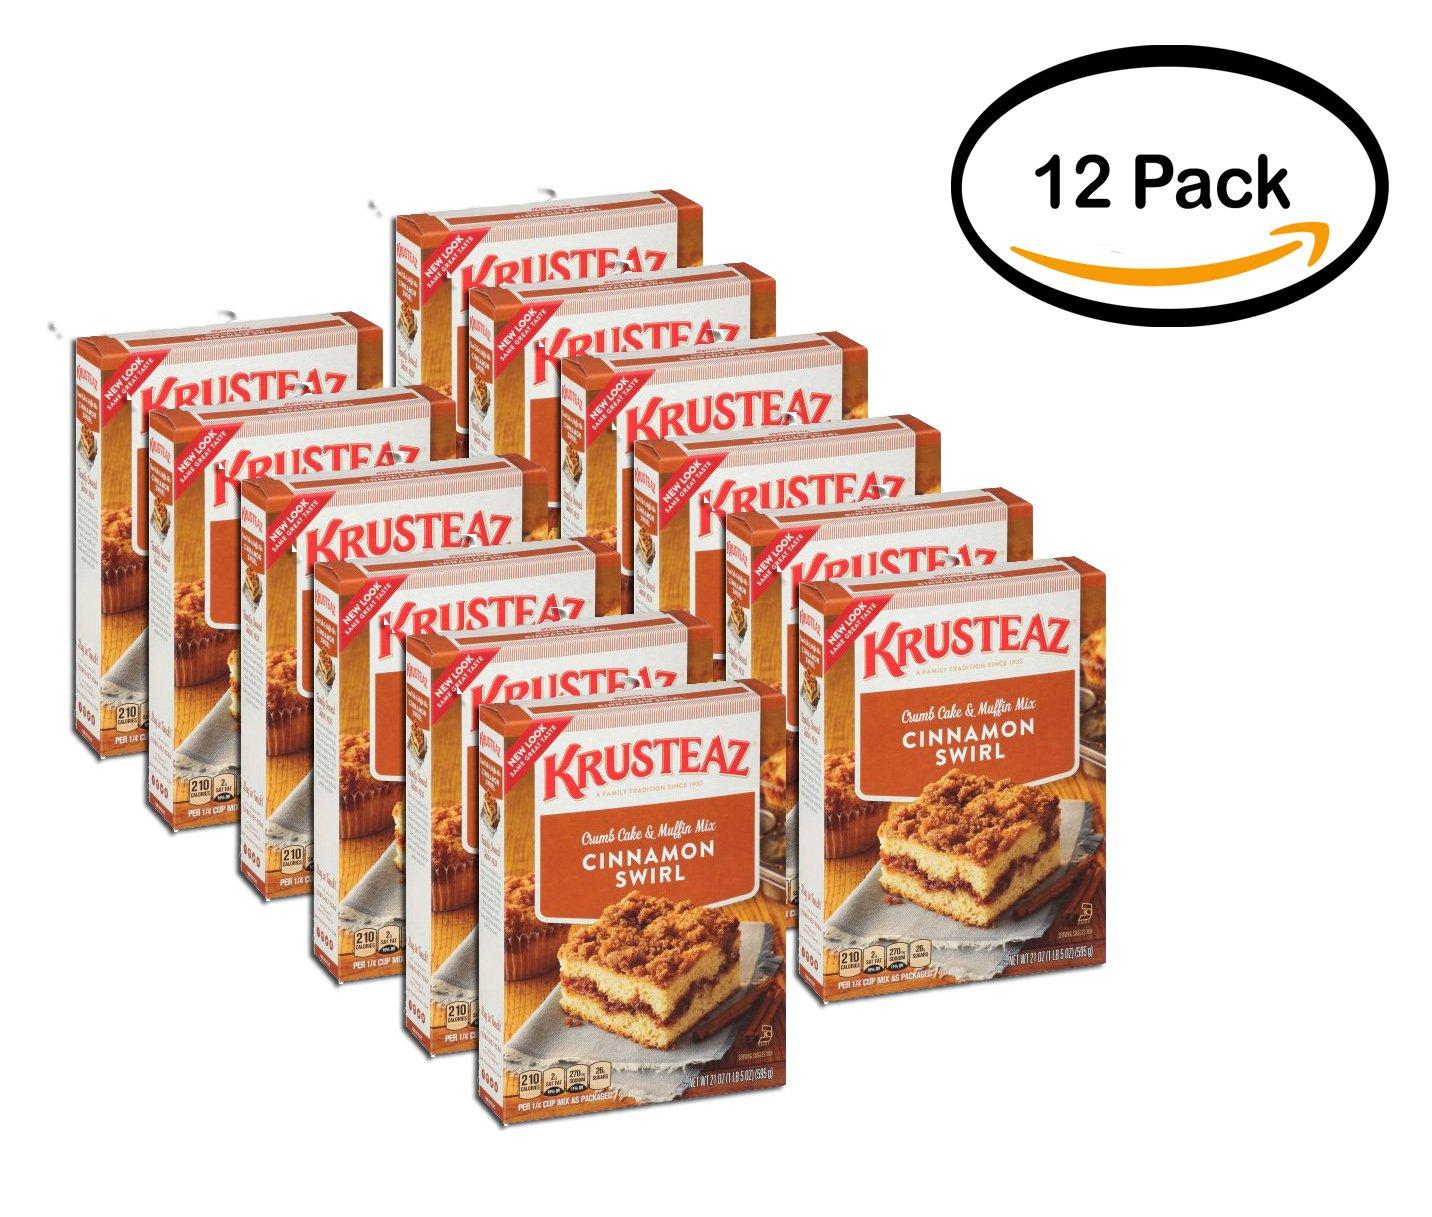 PACK OF 12 - Krusteaz Cinnamon Swirl Crumb Cake & Muffin Mix, 21 oz by Krusteaz